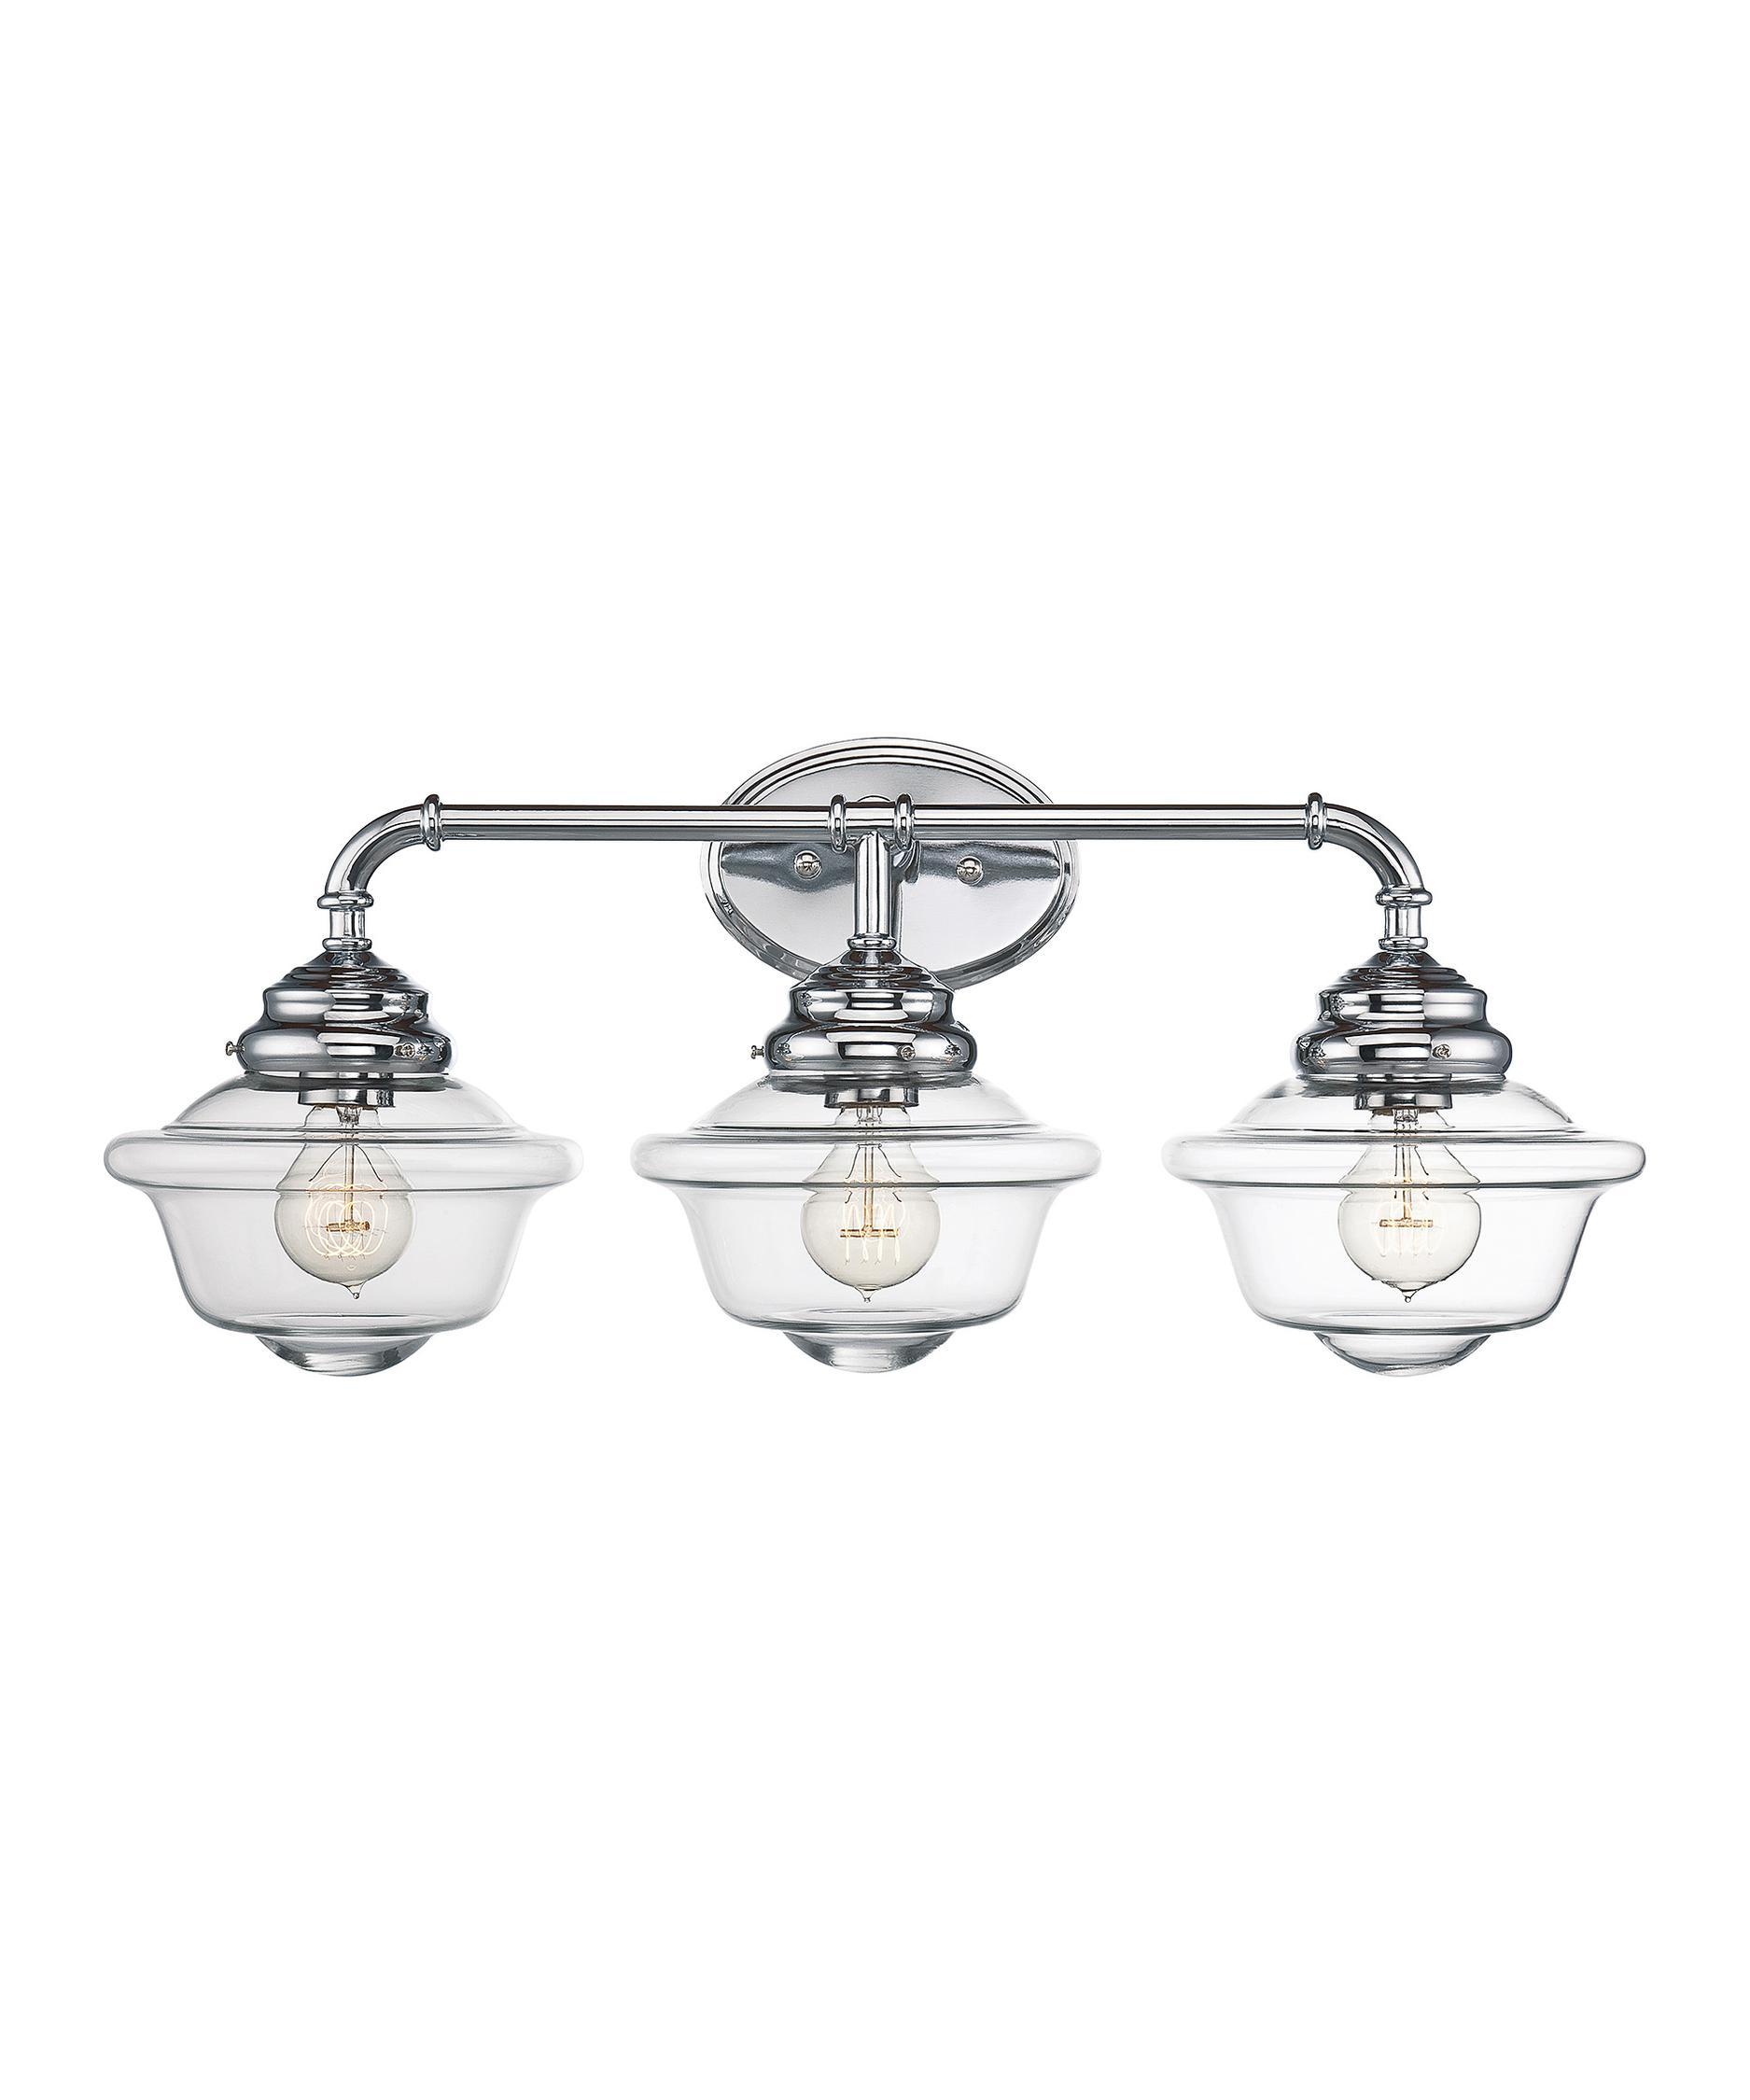 Savoy House 8 393 3 Fairfield 26 Inch Bath Vanity Light